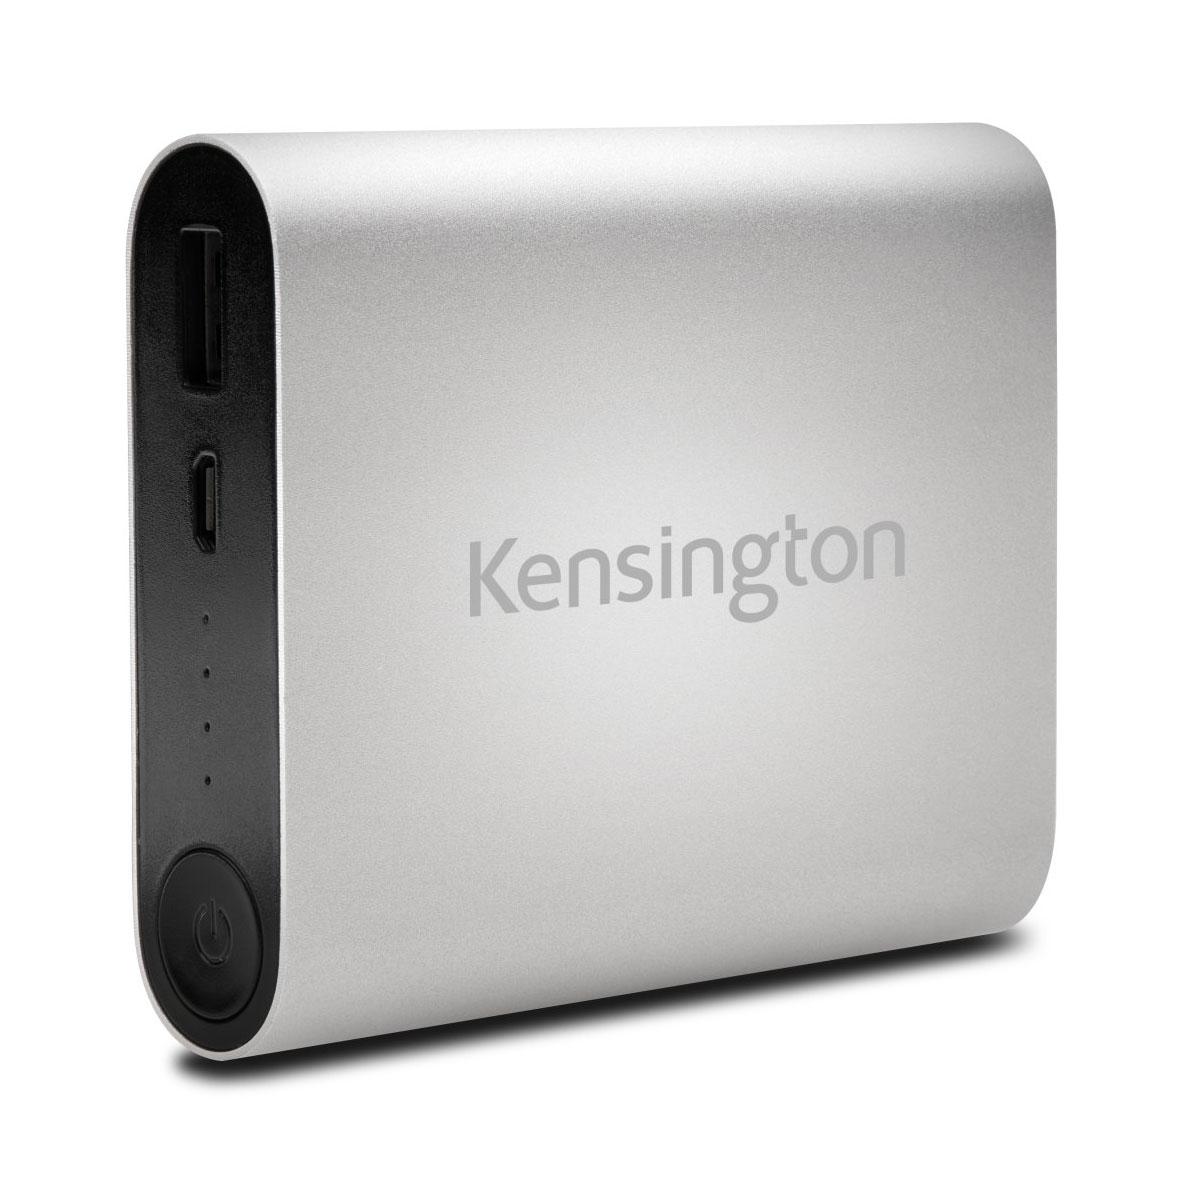 kensington power bank 10400 mah batterie externe kensington sur. Black Bedroom Furniture Sets. Home Design Ideas